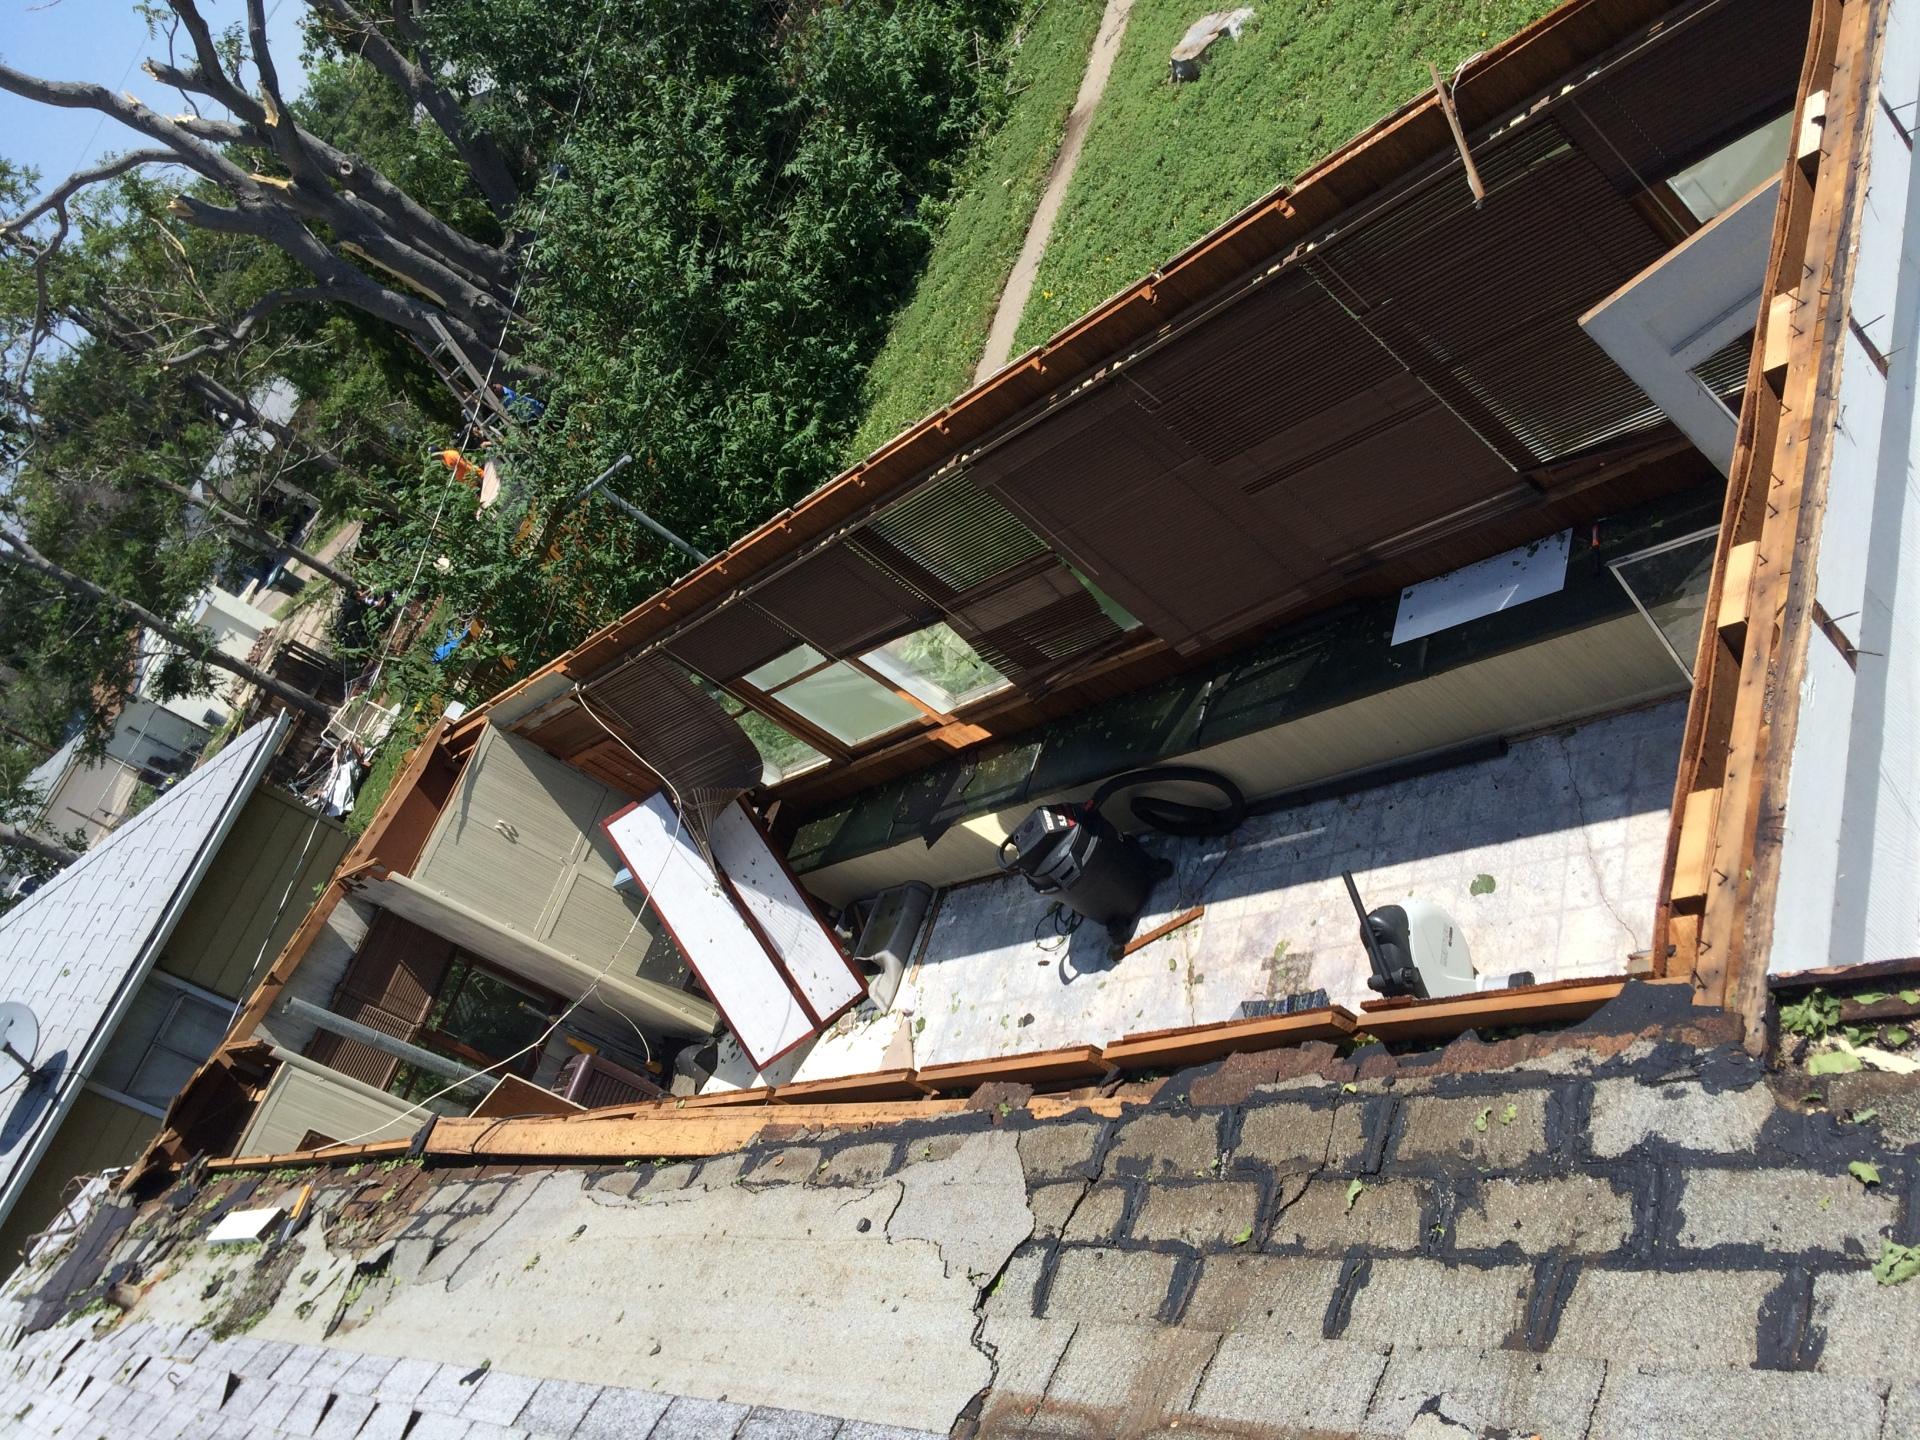 Wind damage after a severe storm